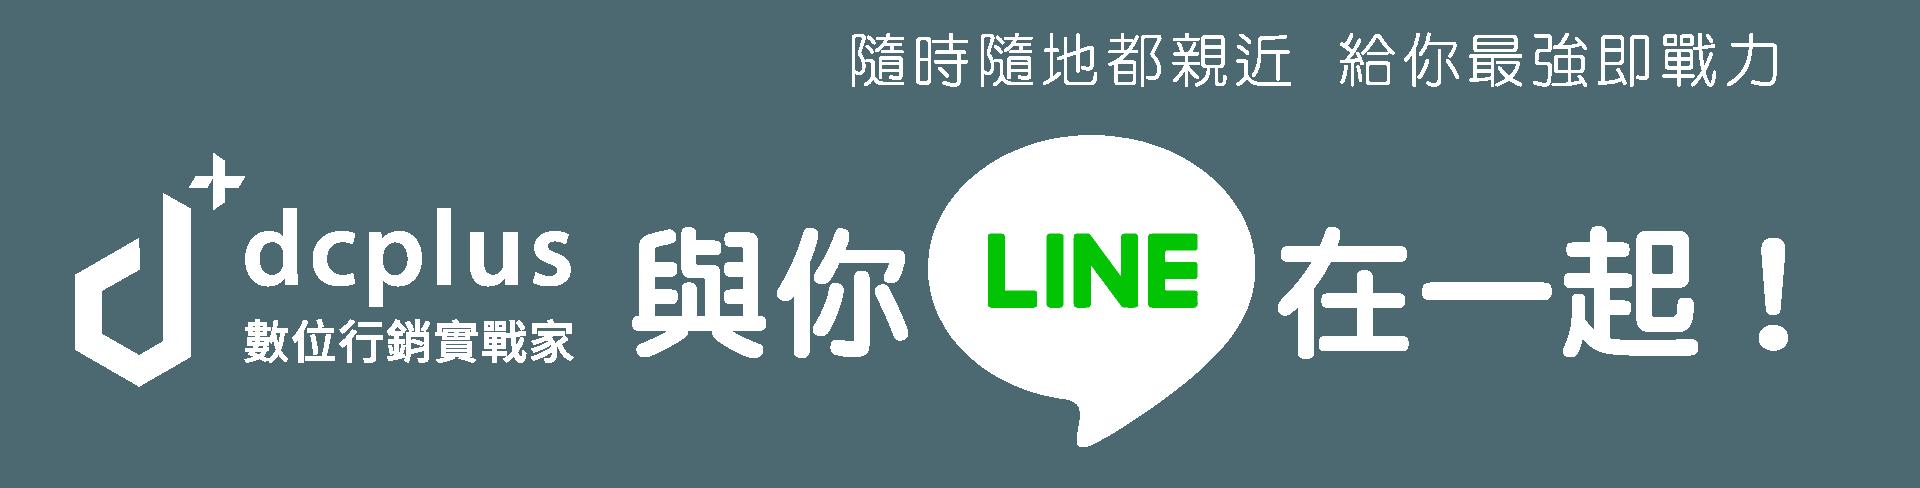 line-title-01